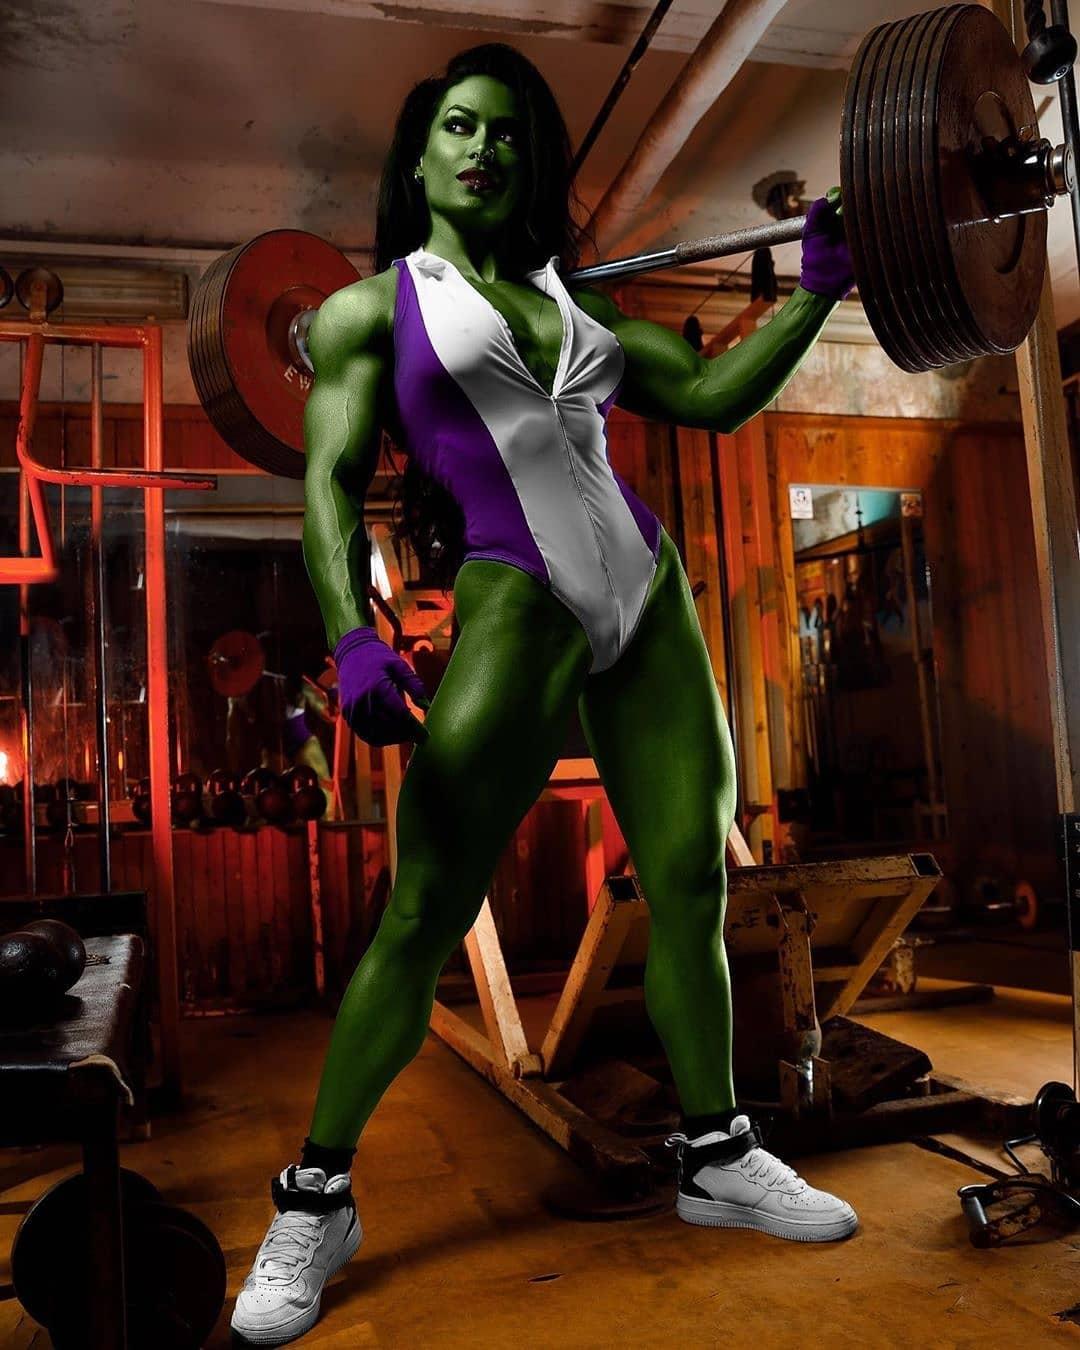 Shehulk hulk cosplay by harvimonroe photo by apinphoto